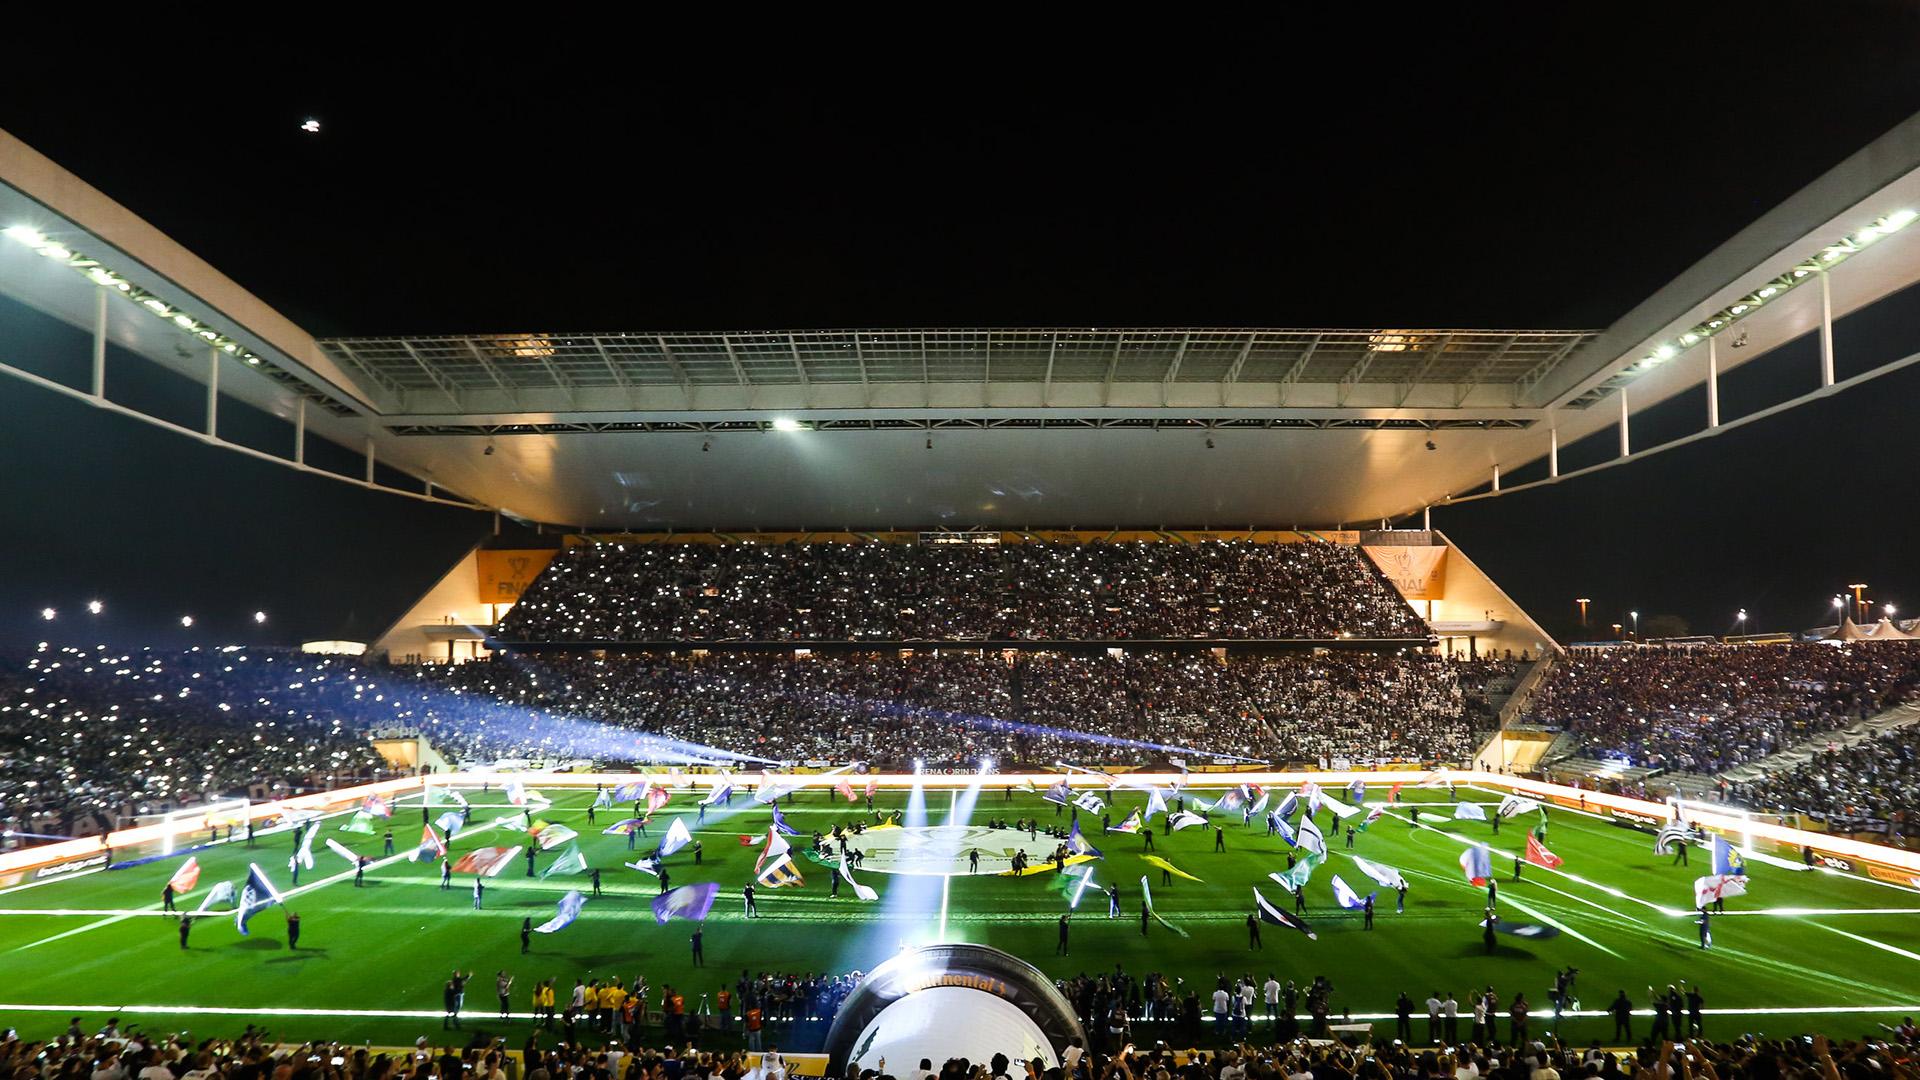 Arena Corinthians view 2018